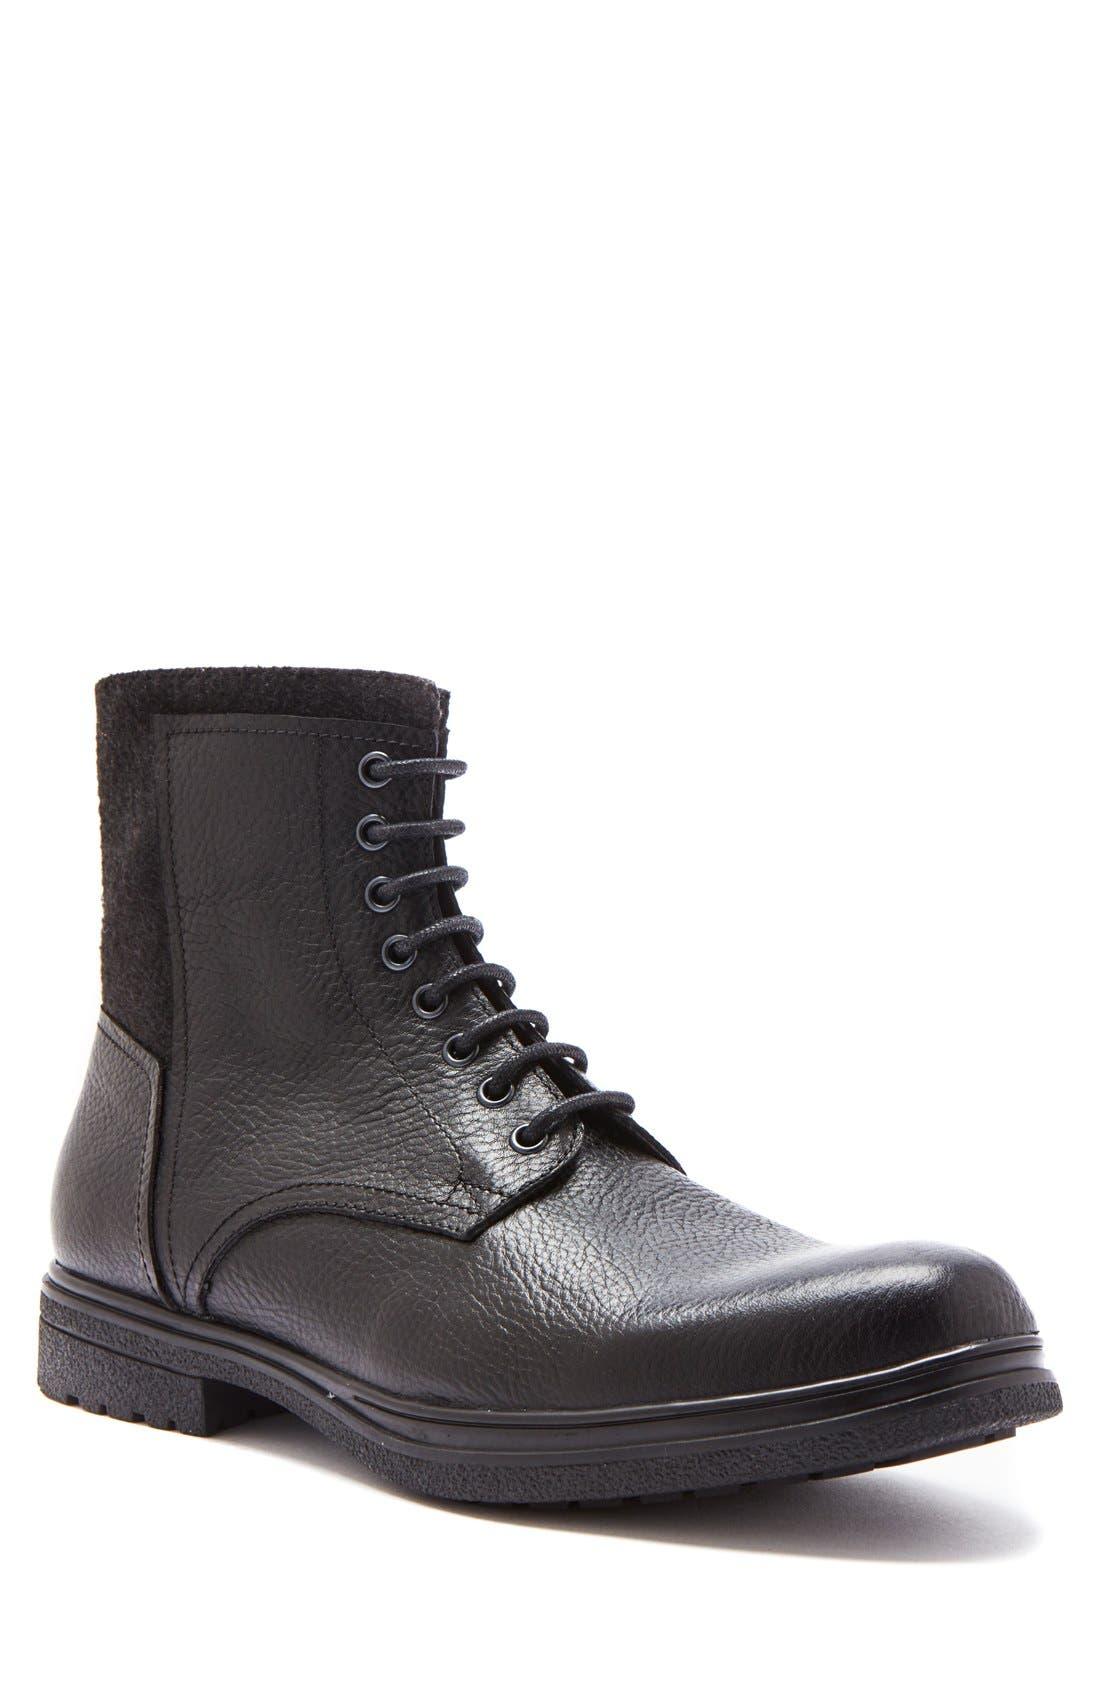 'Backoff' Waterproof Plain Toe Boot,                             Main thumbnail 1, color,                             Black Leather